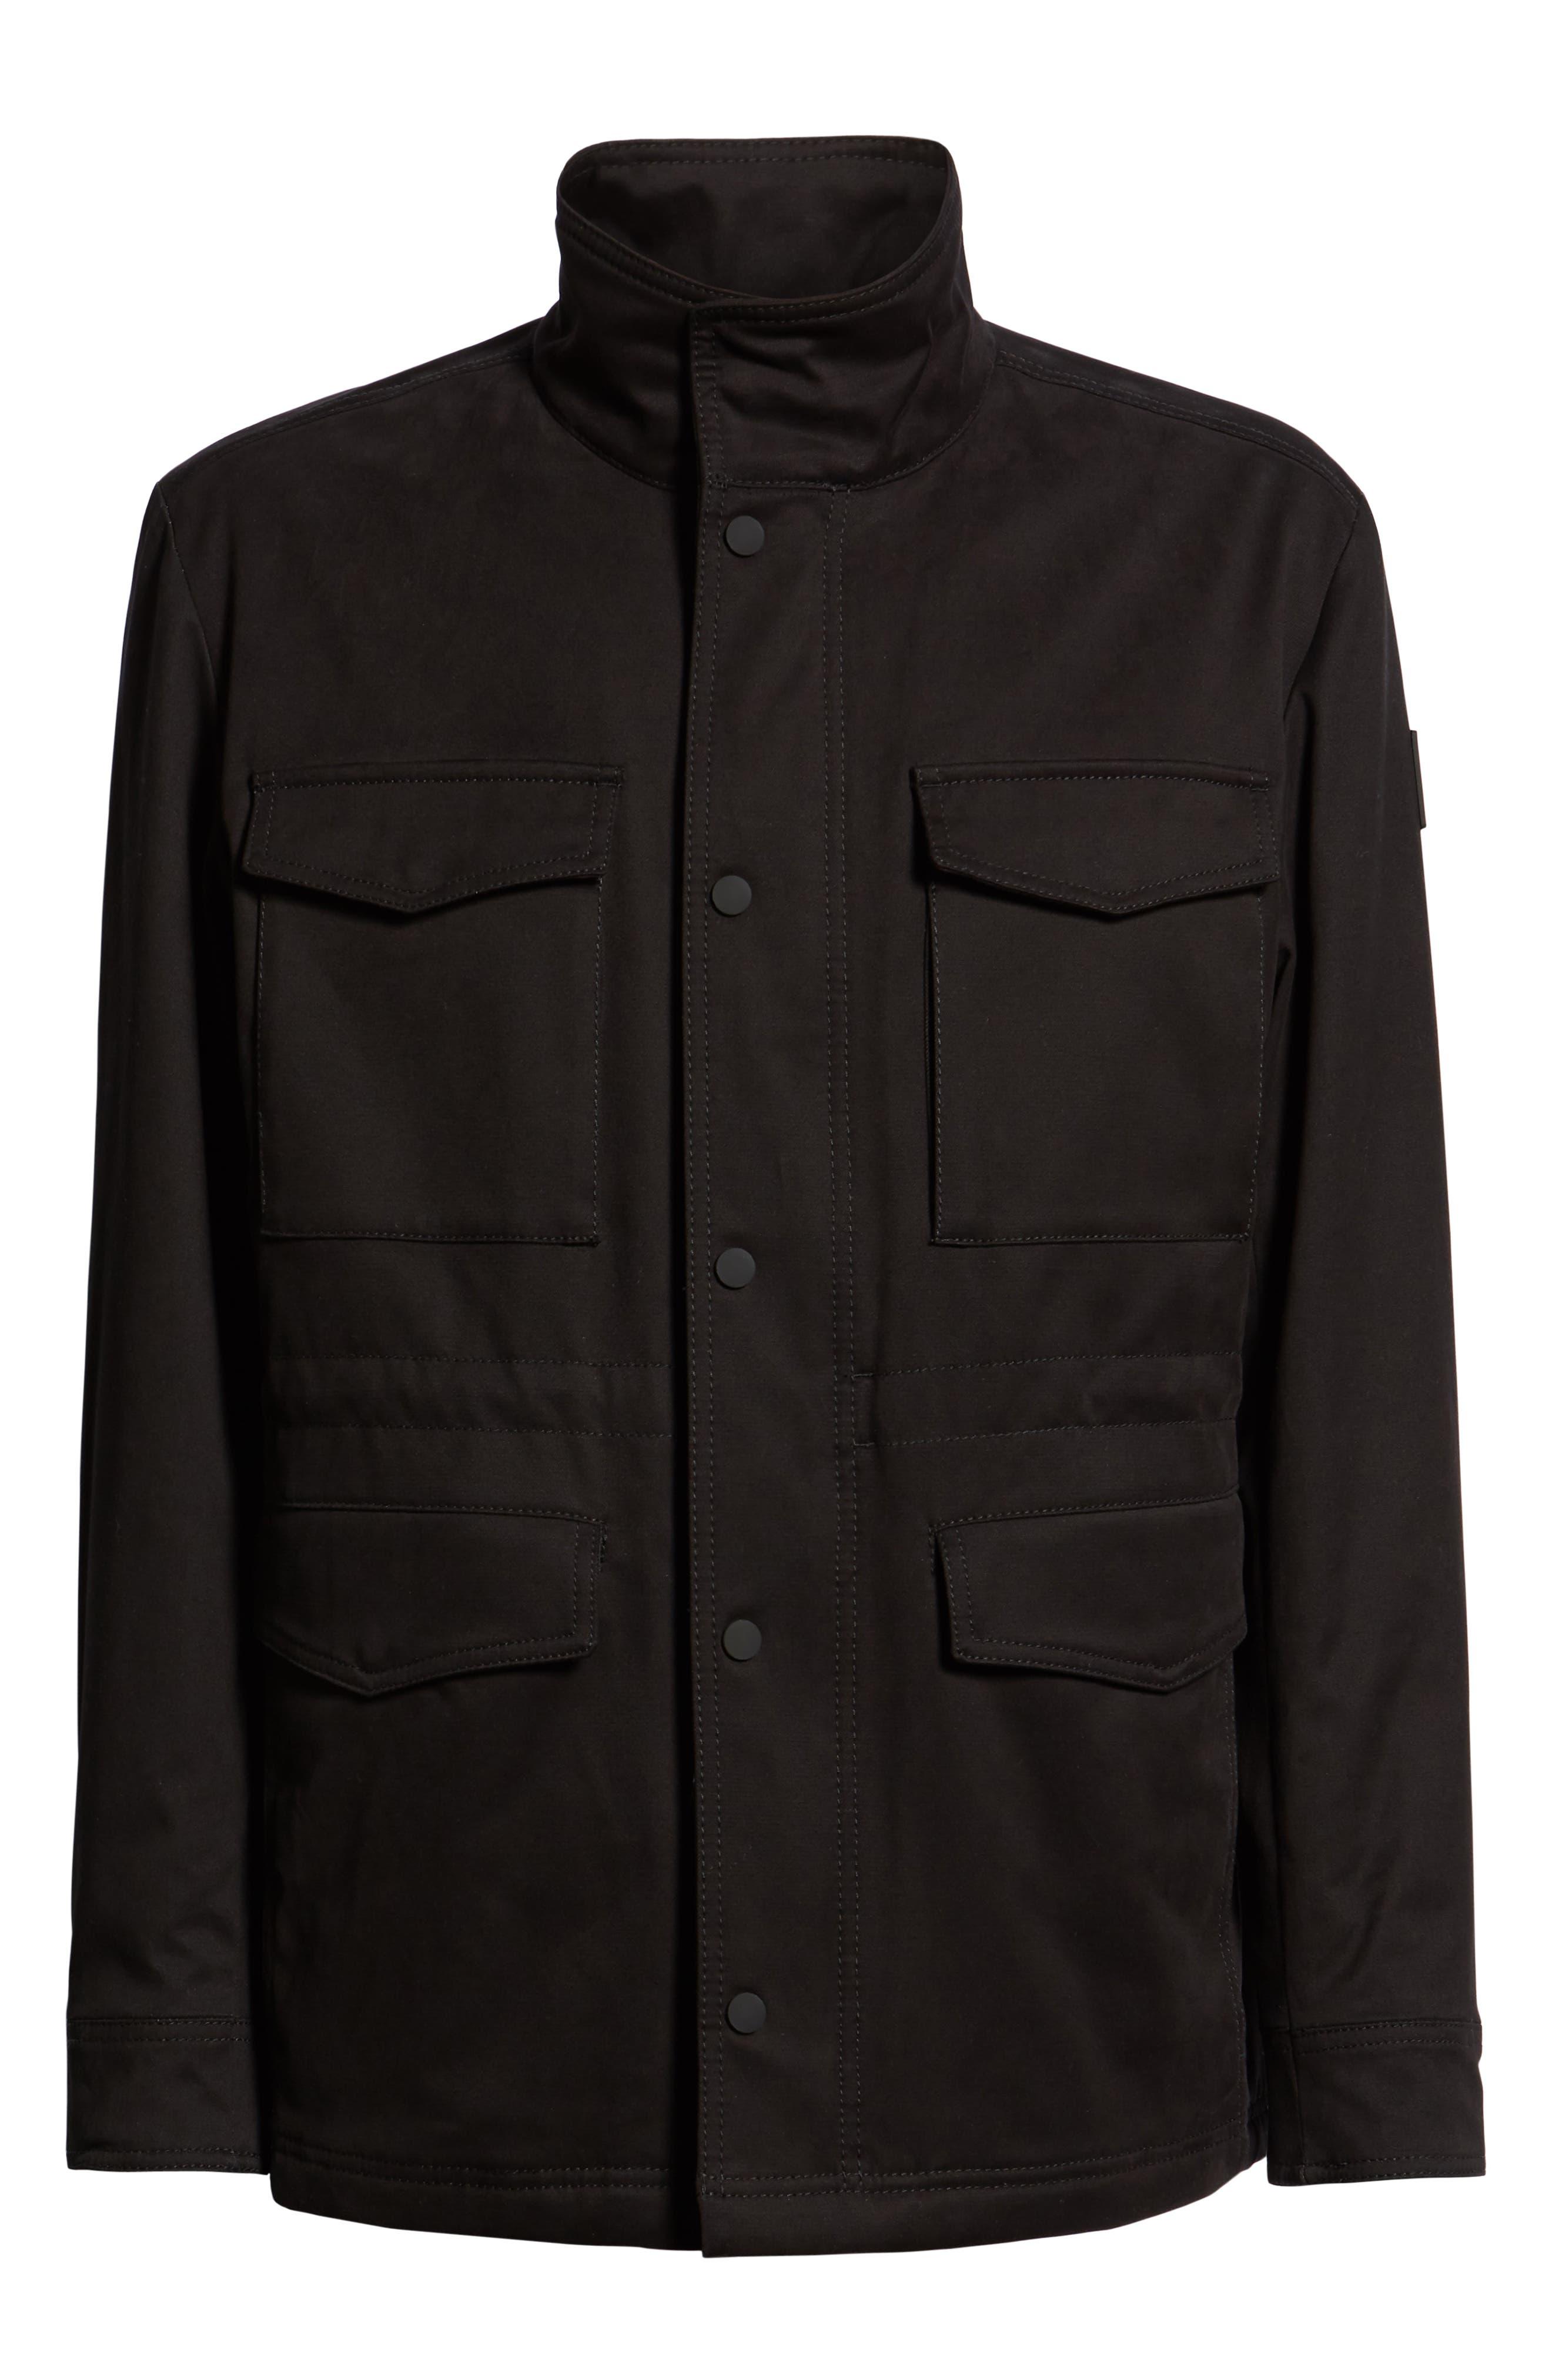 Oroy Regular Fit Field Jacket,                             Alternate thumbnail 5, color,                             BLACK